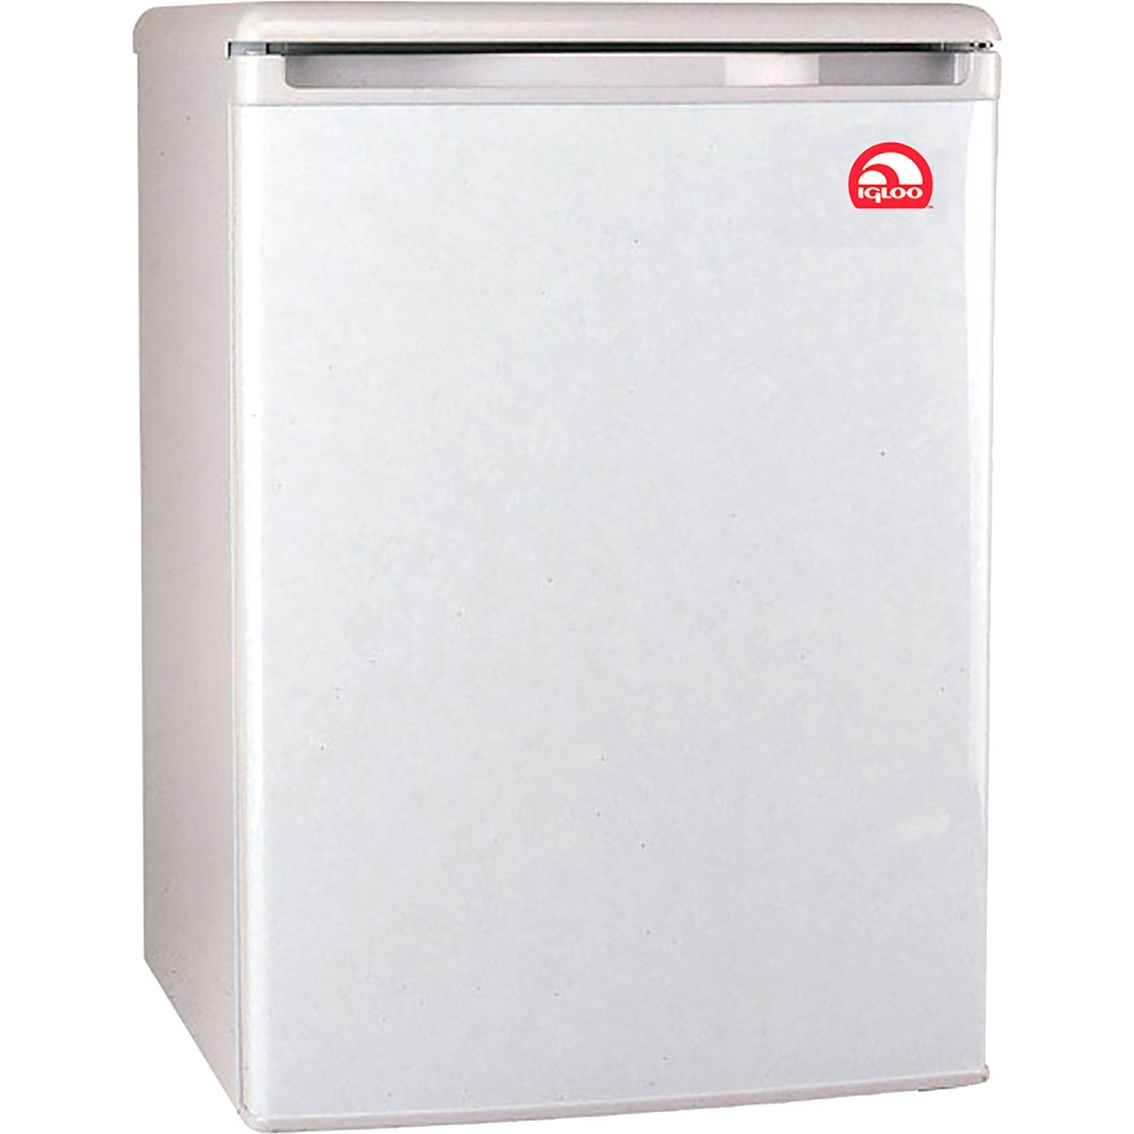 Igloo 3 2 Cu Ft Mini Fridge Refrigerators Home